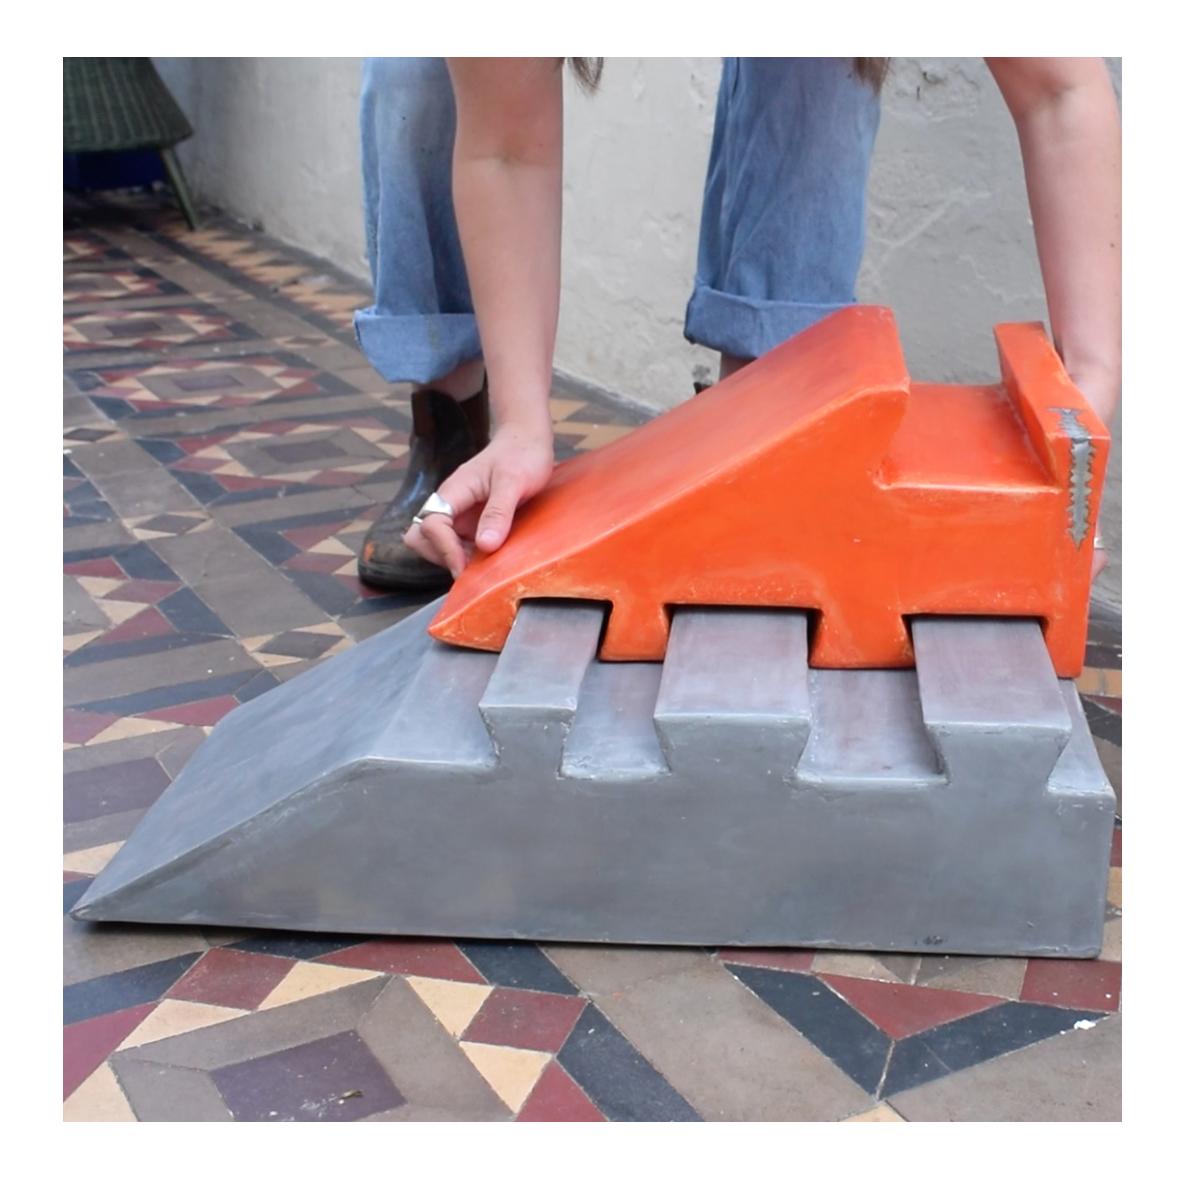 ellie__hayward Doorstop - Putting the Pieces Together, (2019/2020) Jesmonite, Pigment, Metal Powder, Aluminium Etching Plate. 60 x 36 x 29cm